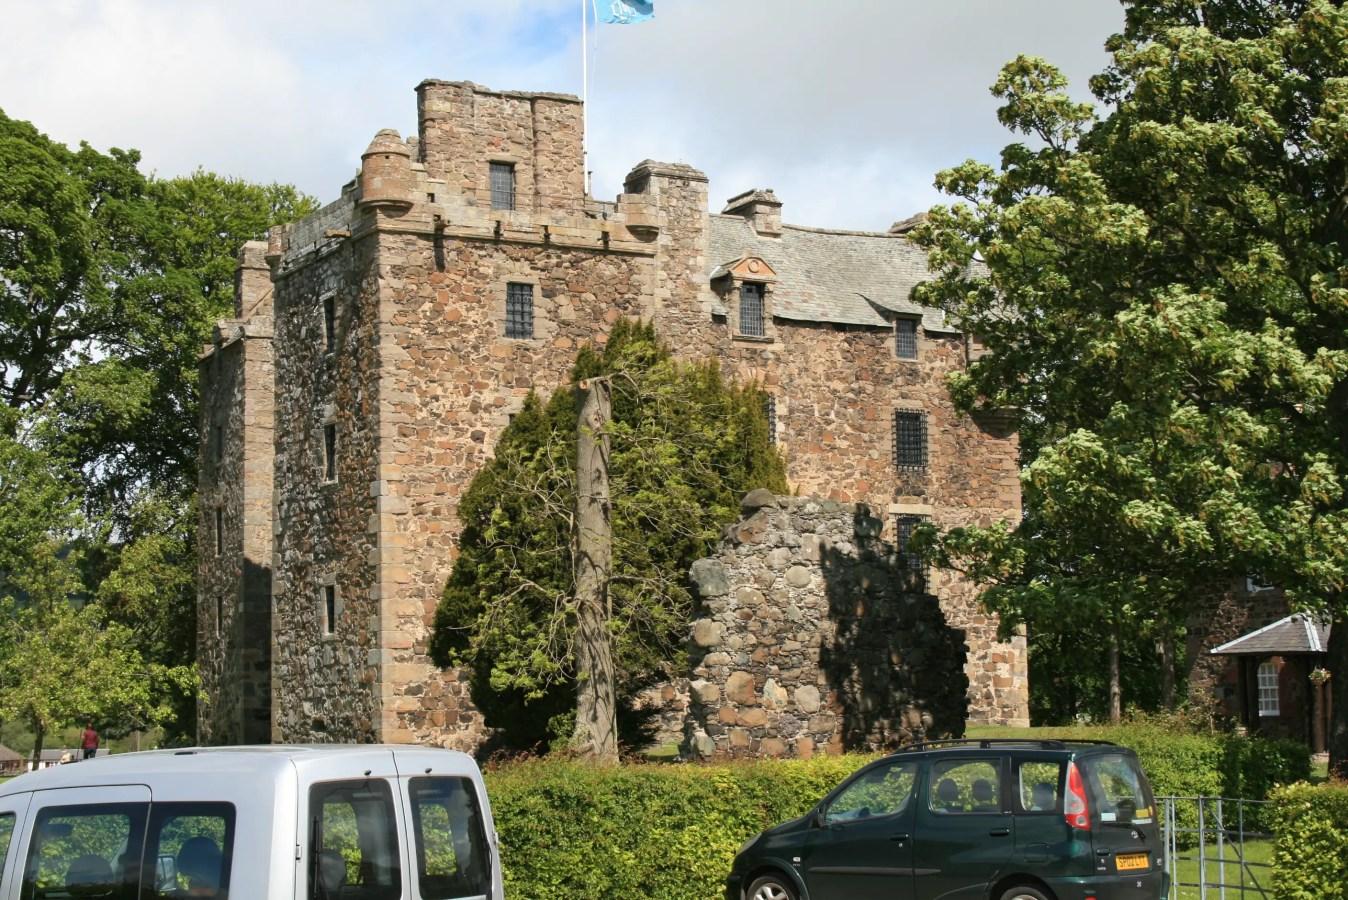 Gruselige Burgen in Schottland, Geisterburgen, Spukschloss in Schottland, Geisterschlösser in Schottland